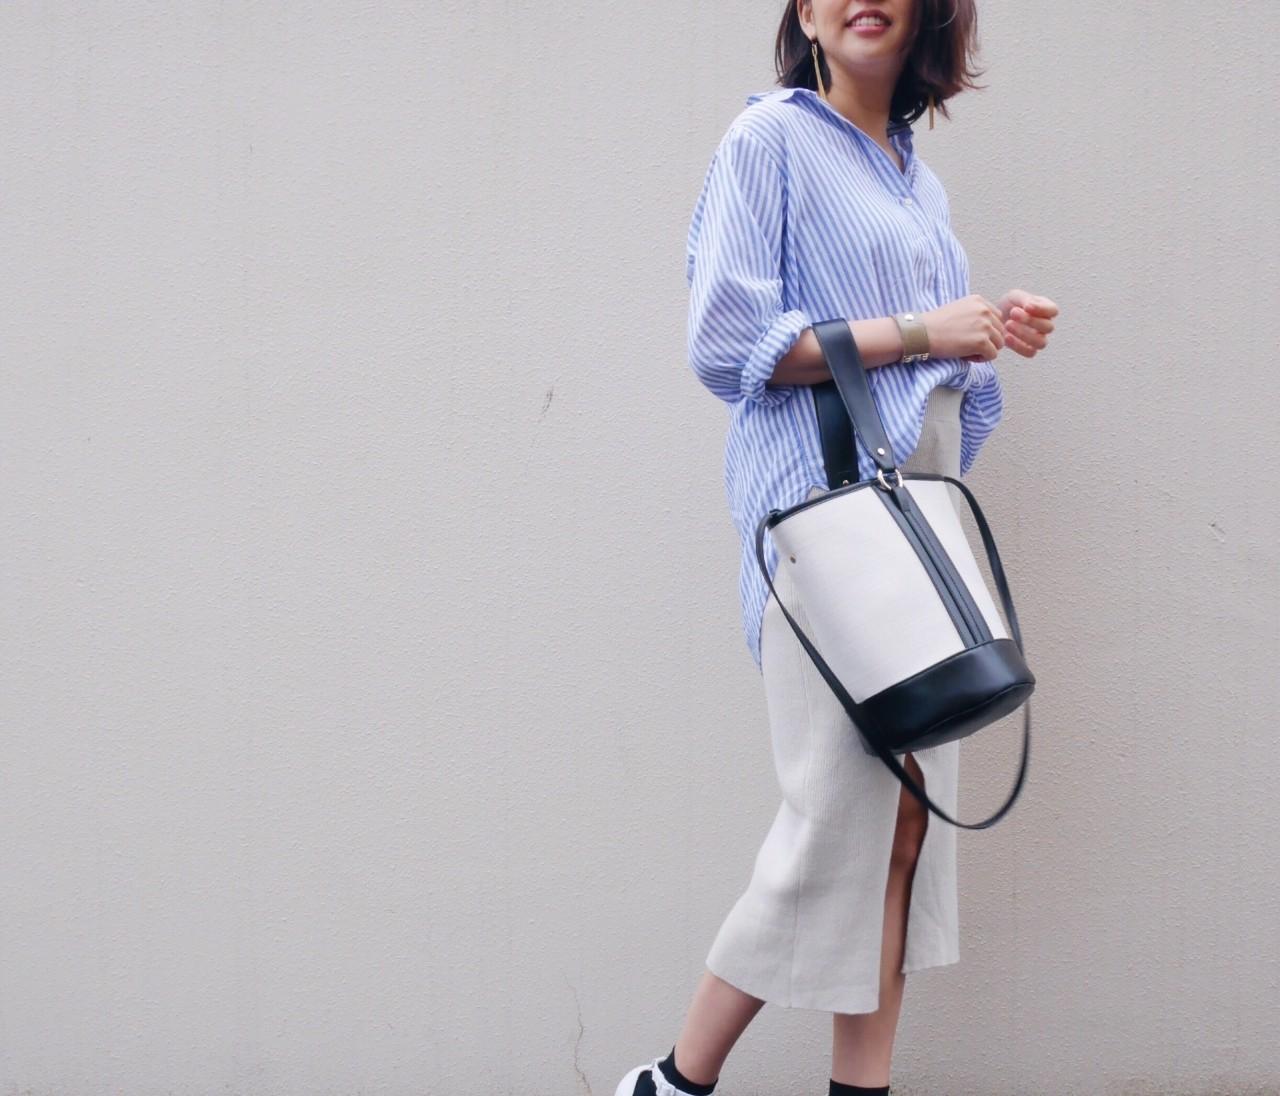 H&Mのビッグシルエットシャツに靴下×サンダル。